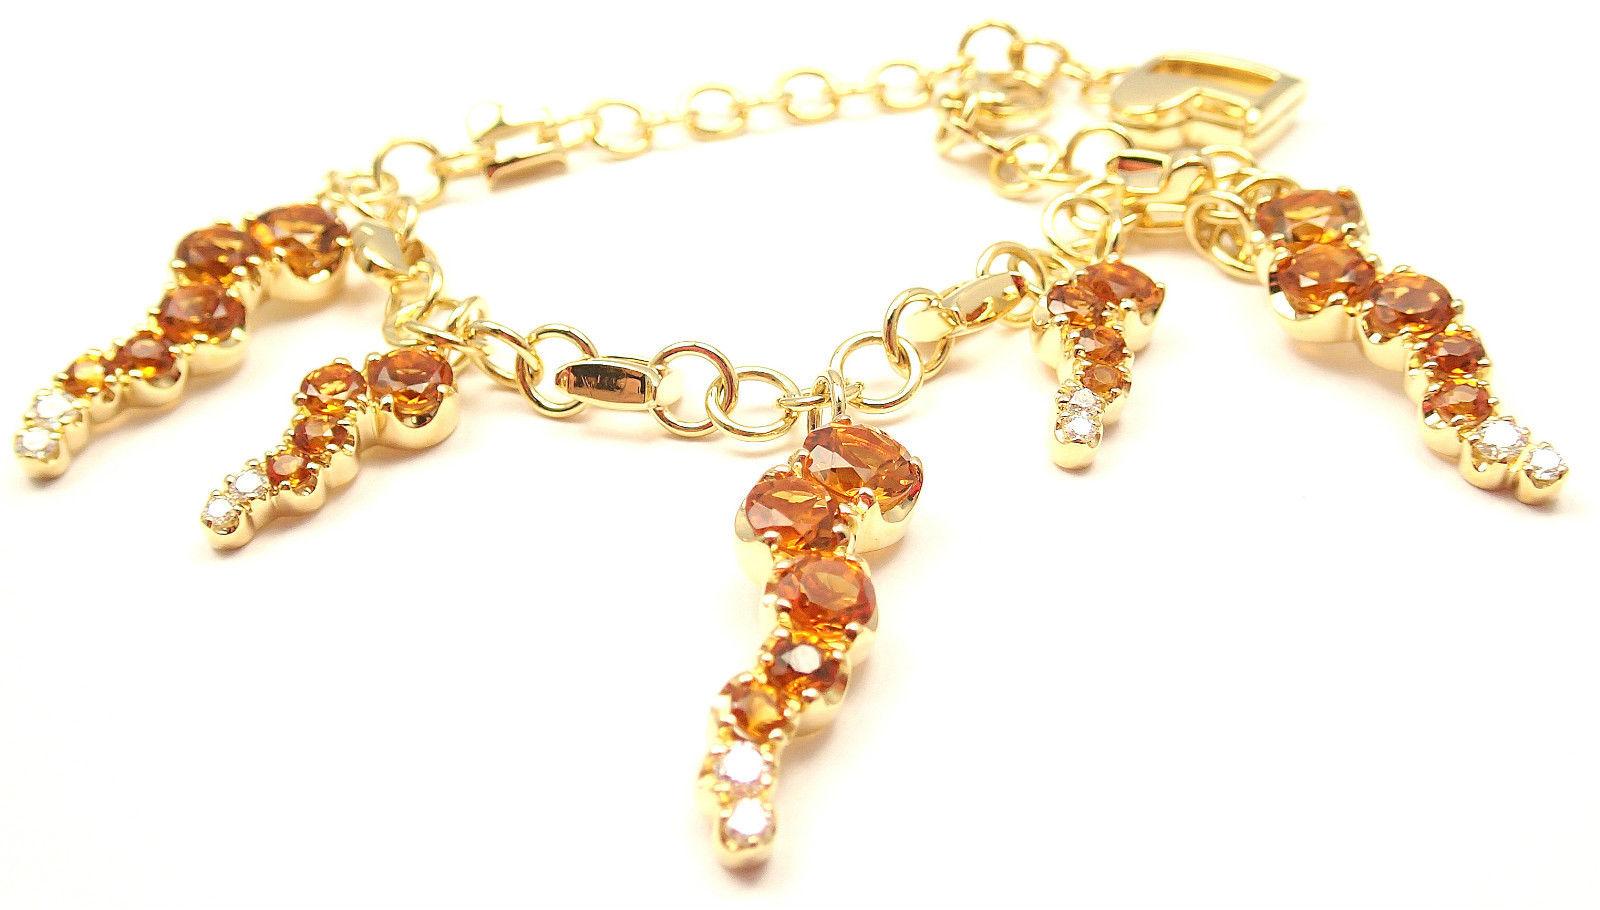 """""Pasquale Bruni 18K Yellow Gold Ray Sun Citrine Diamond Bracelet"""""" 140911"